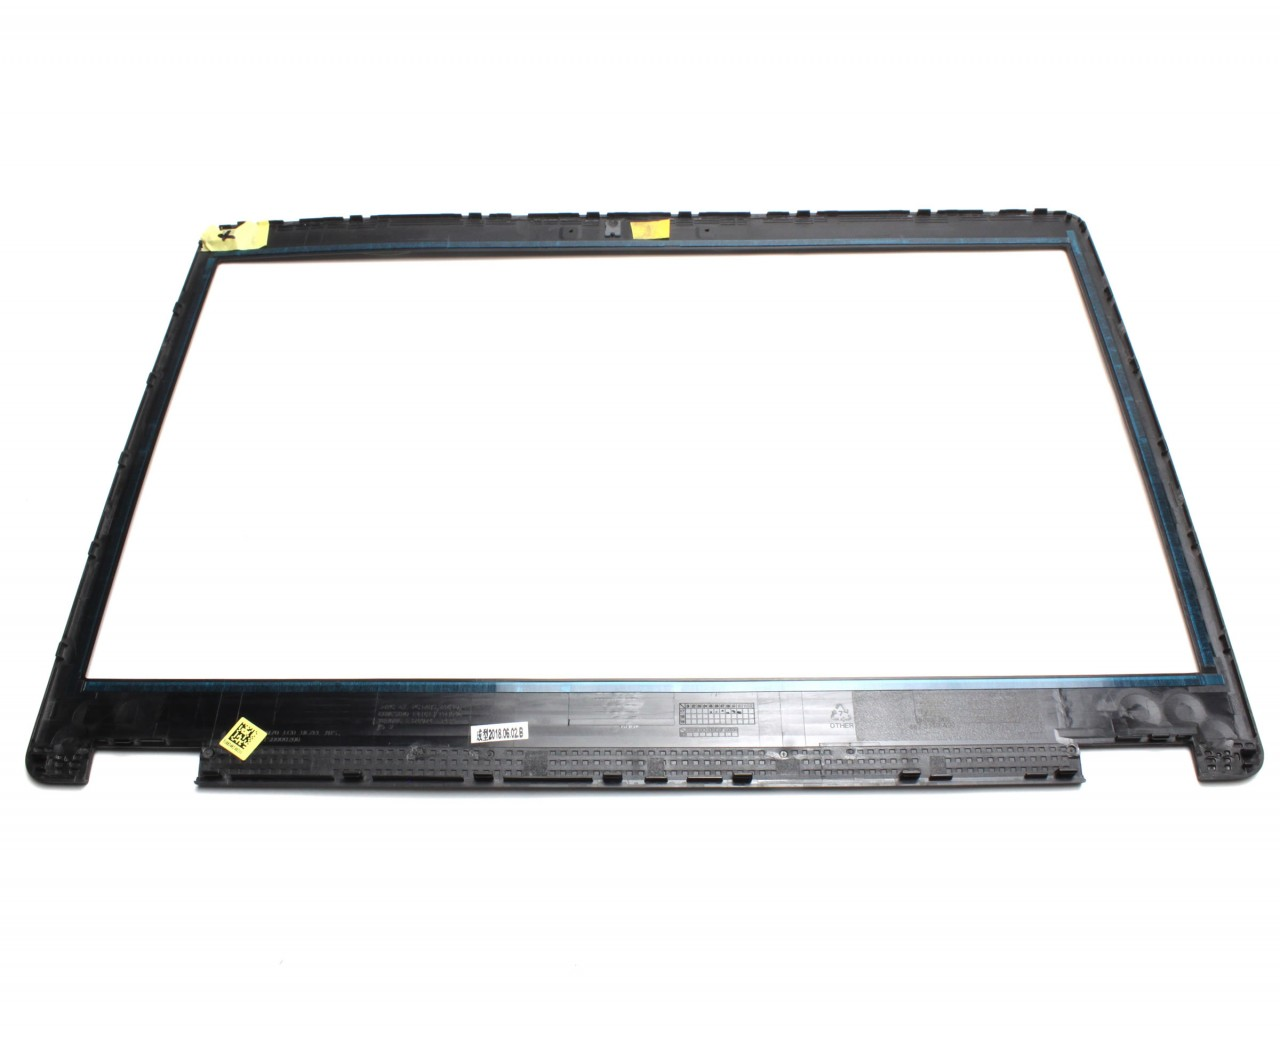 Rama Display Dell Latitude E5480 Bezel Front Cover Neagra imagine powerlaptop.ro 2021